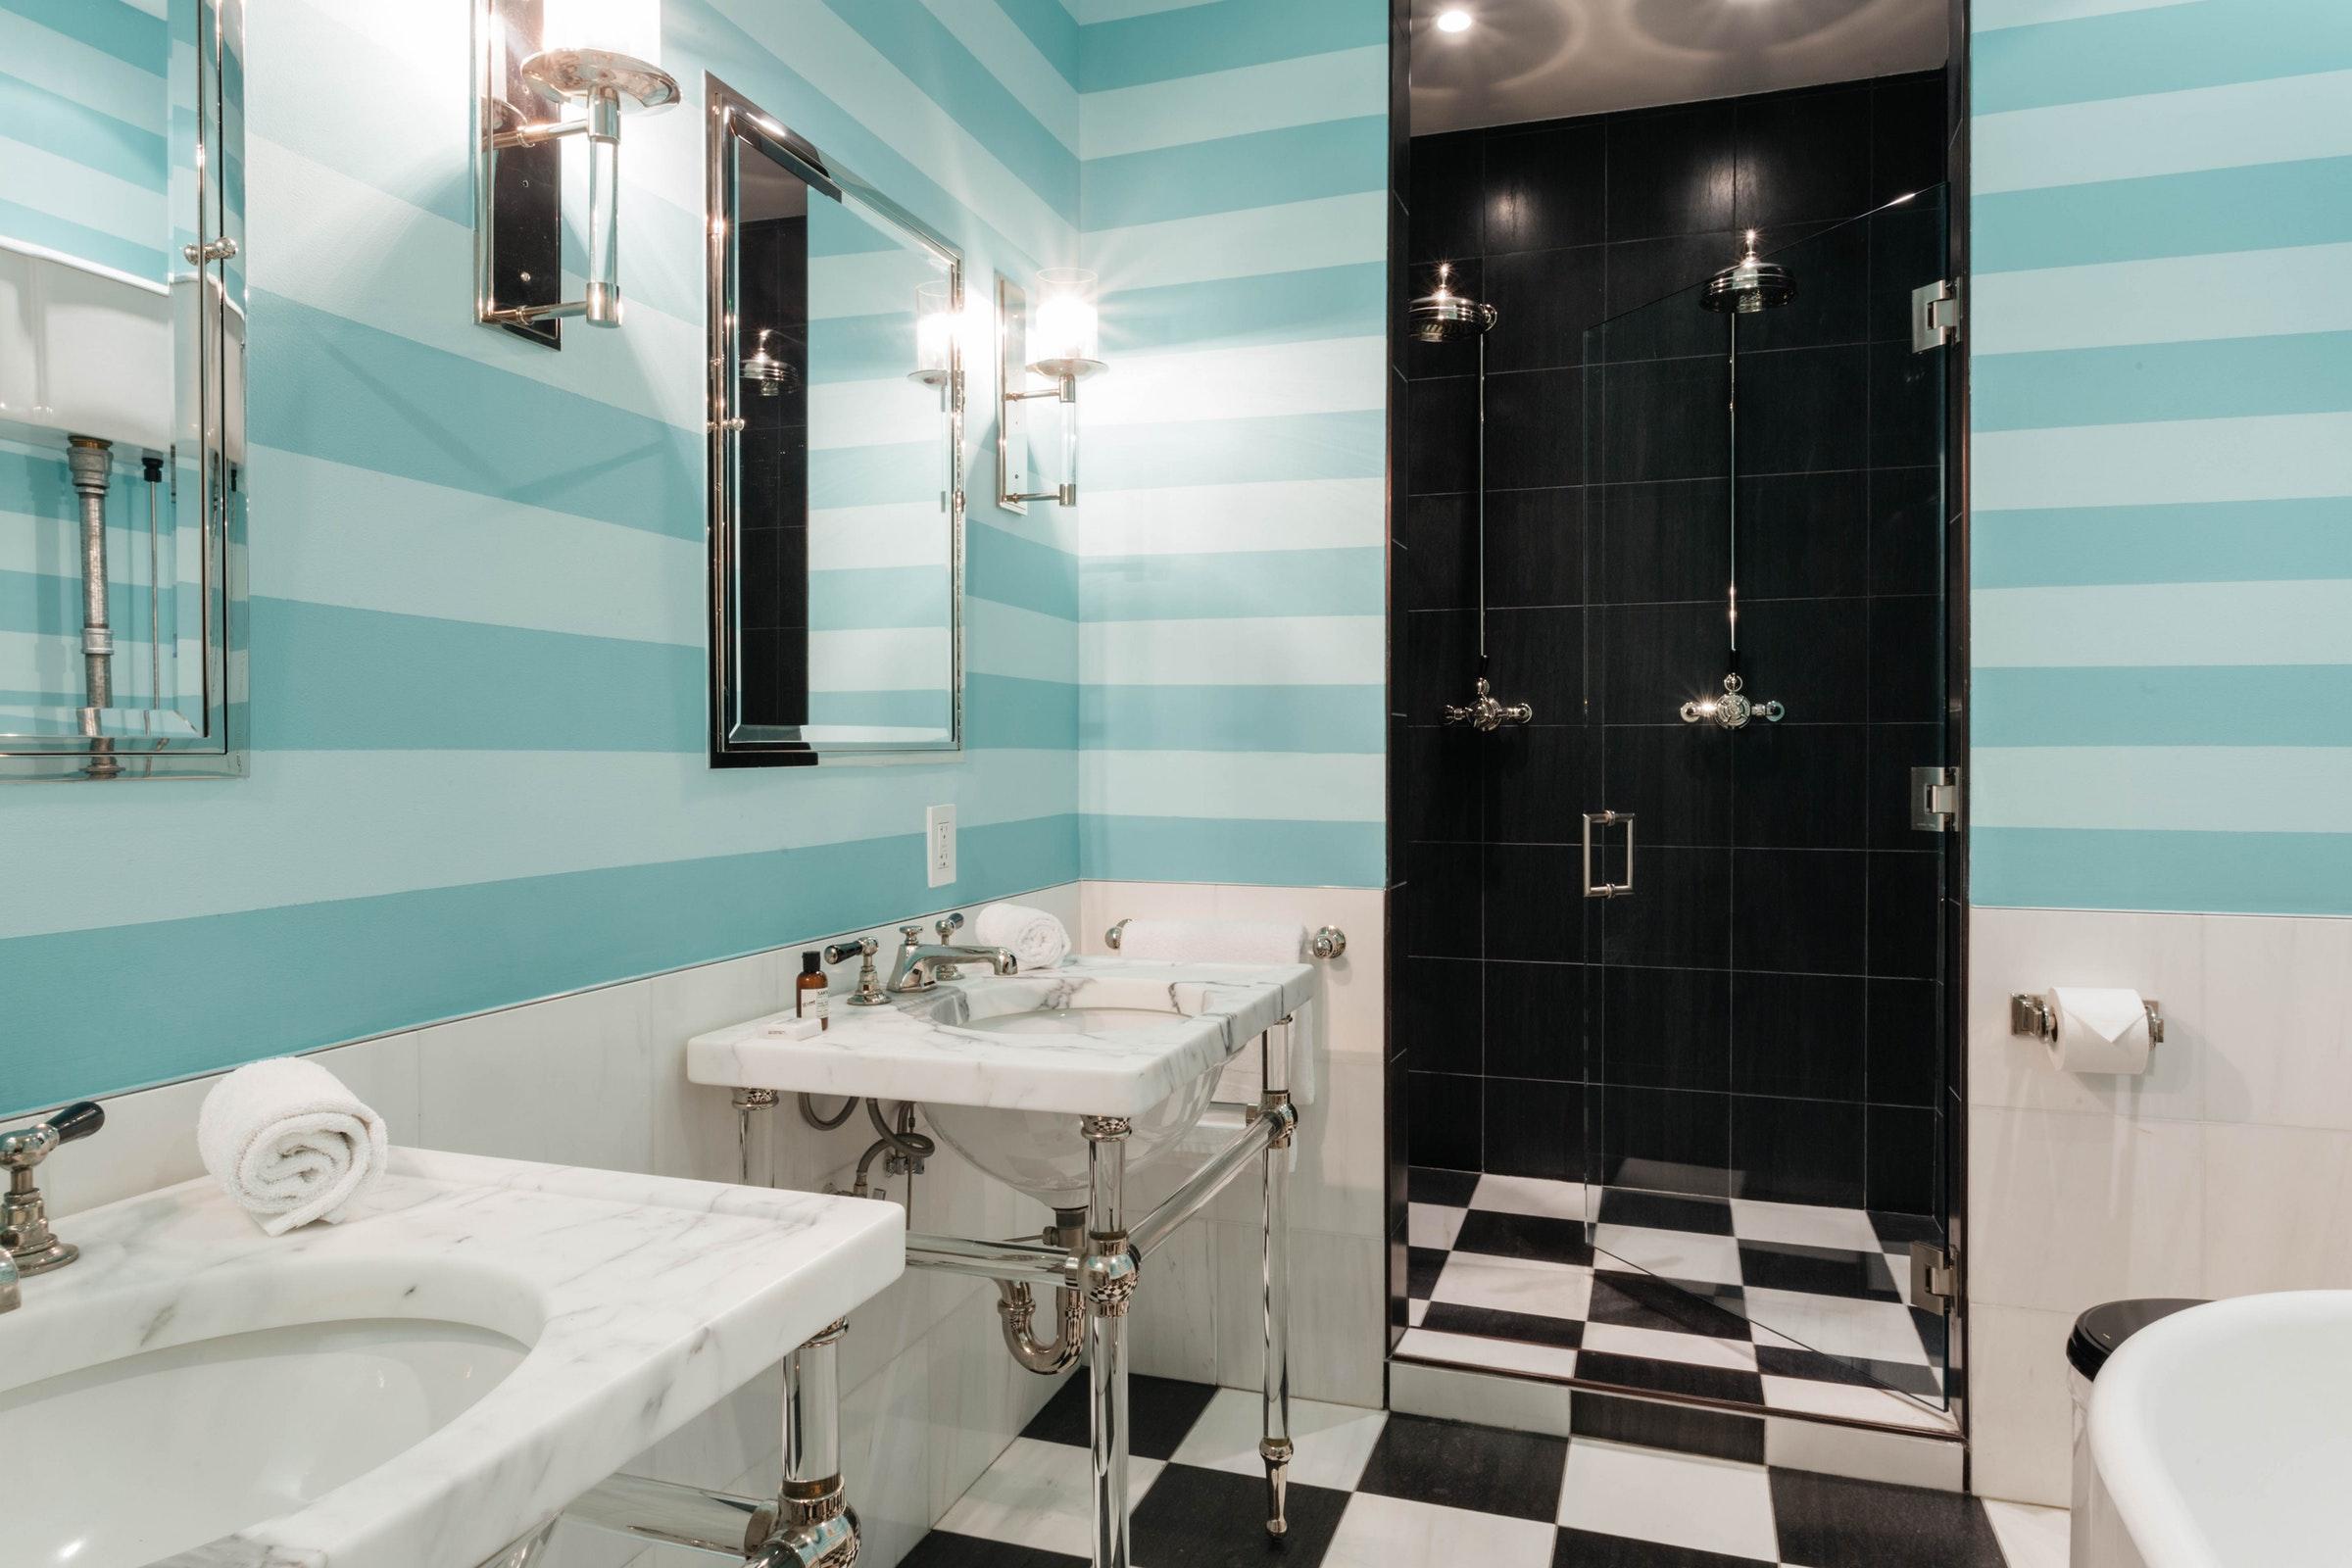 ванная комната душ раковина зеркало